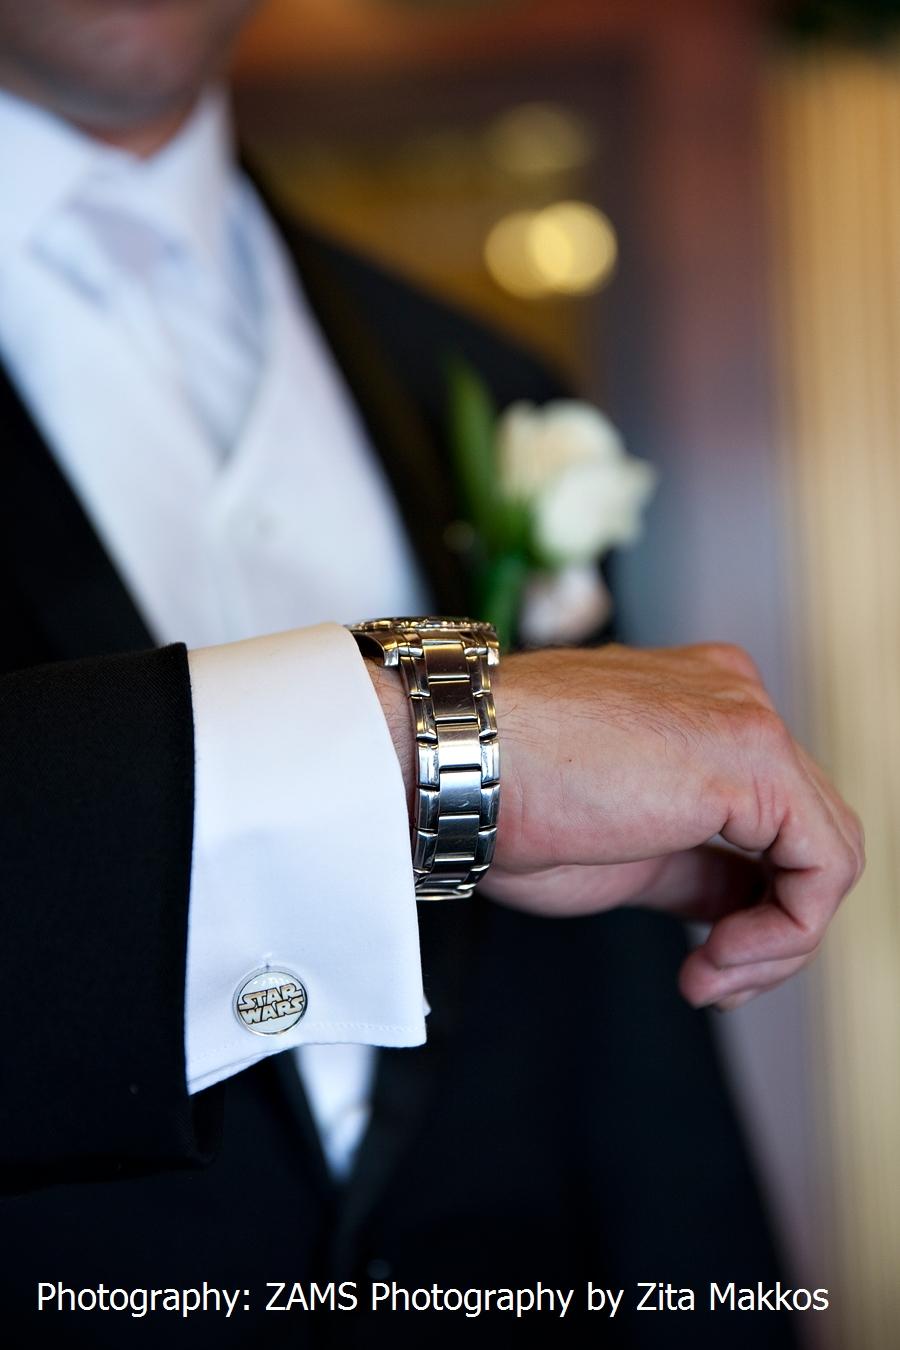 godfather_vitoandmichael_movie_cuff_links_men_weddings_cufflinks_2.jpg